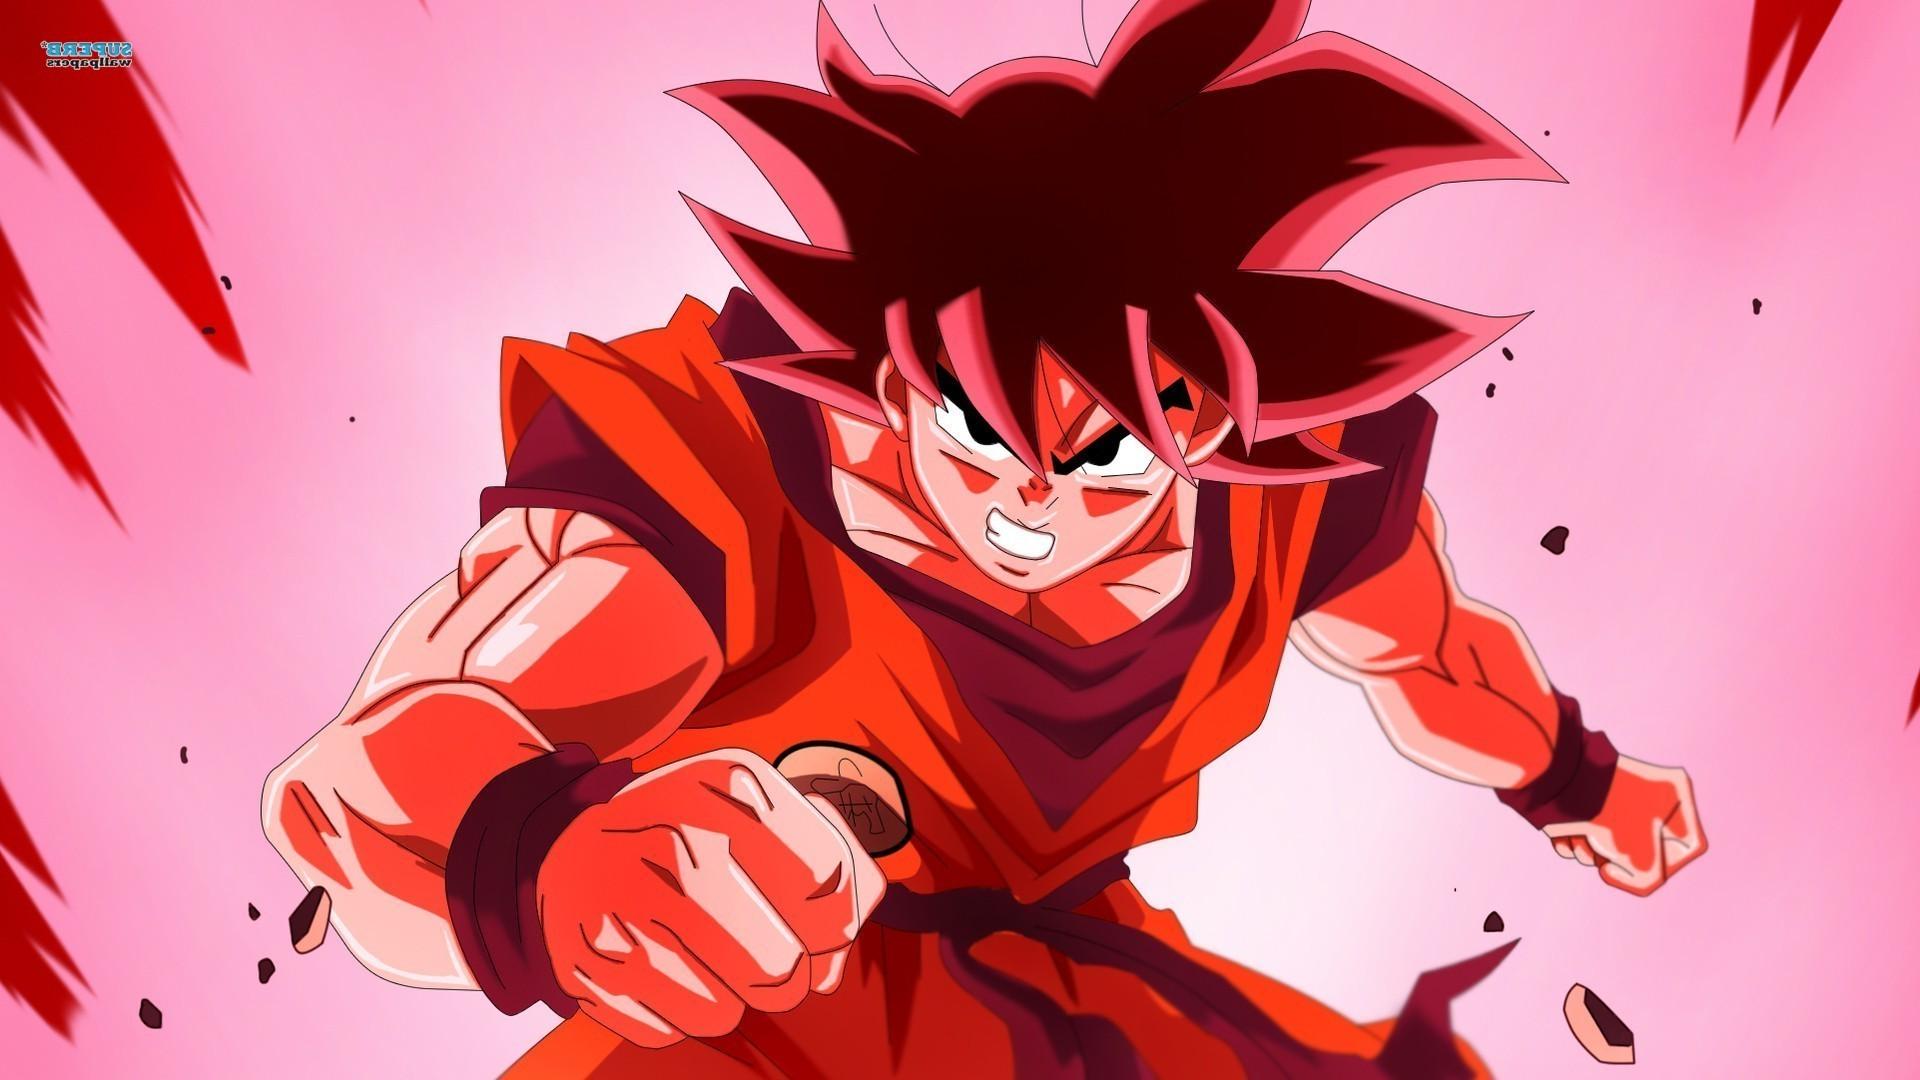 Wallpaper Illustration Anime Red Cartoon Dragon Ball